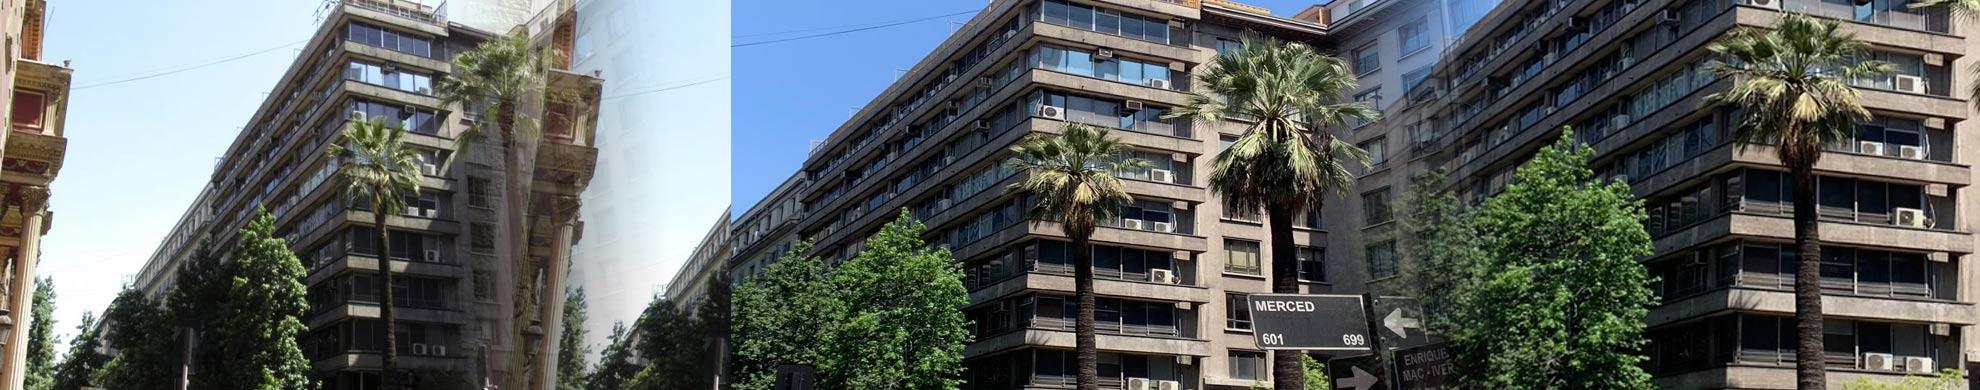 imagen edificios